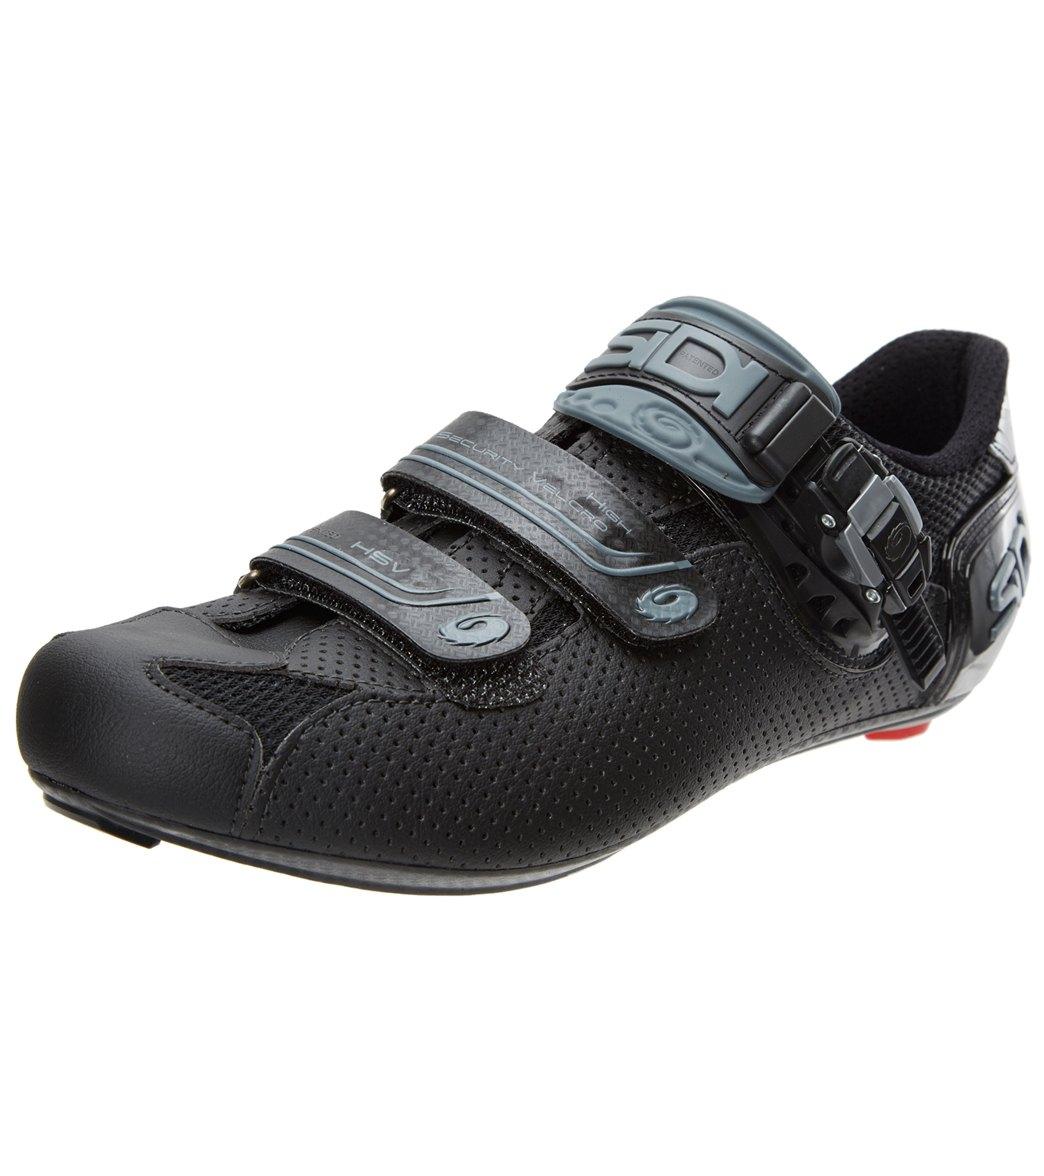 Sidi Genius Fit Carbon Men/'s Road Cycling Shoes Black